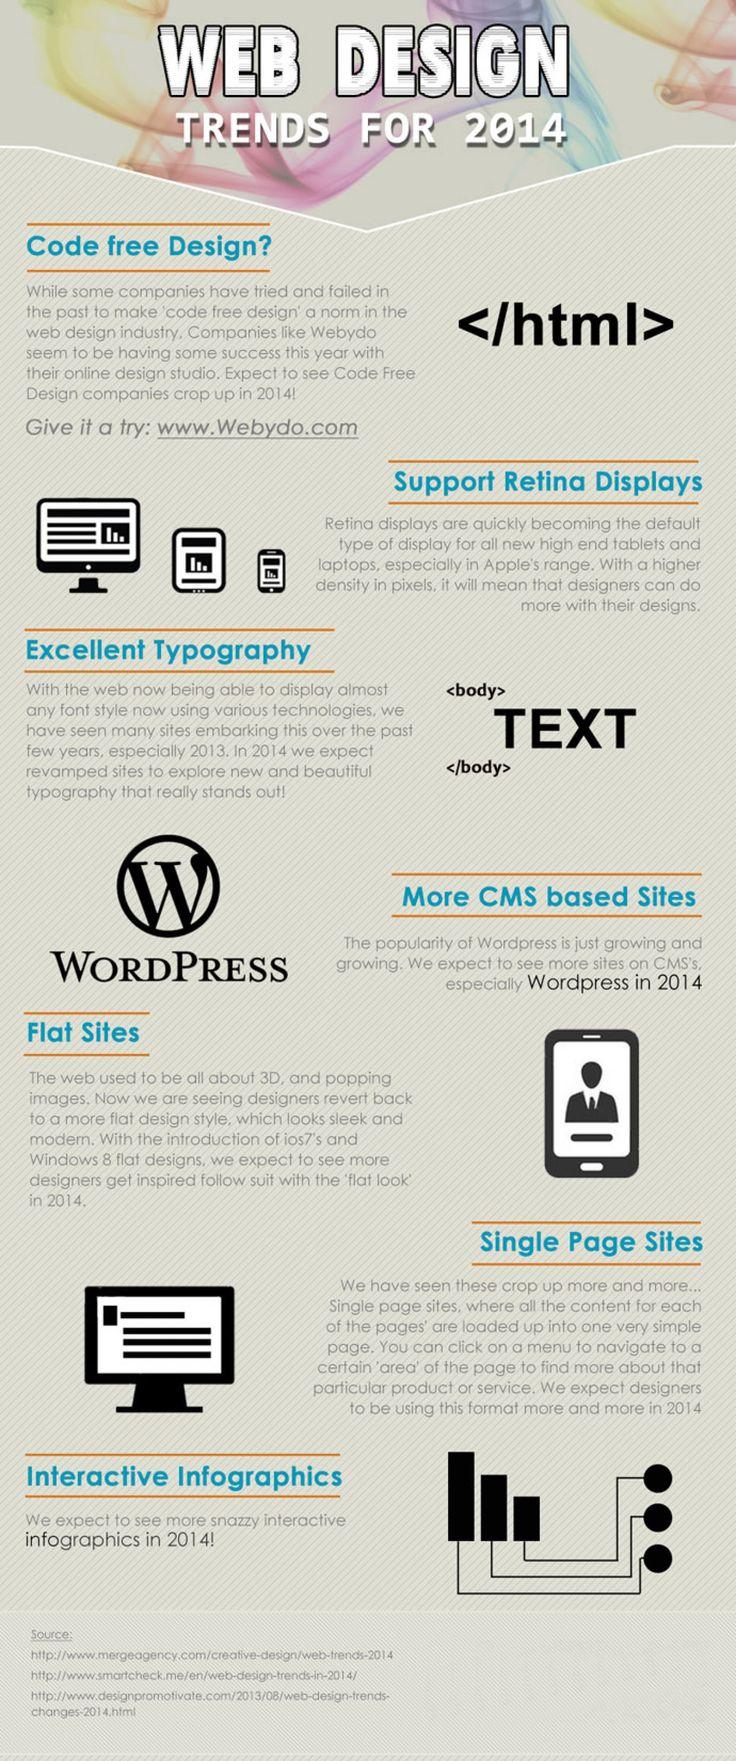 Web Design Trends For 2014 - Infographic - DSI Blog